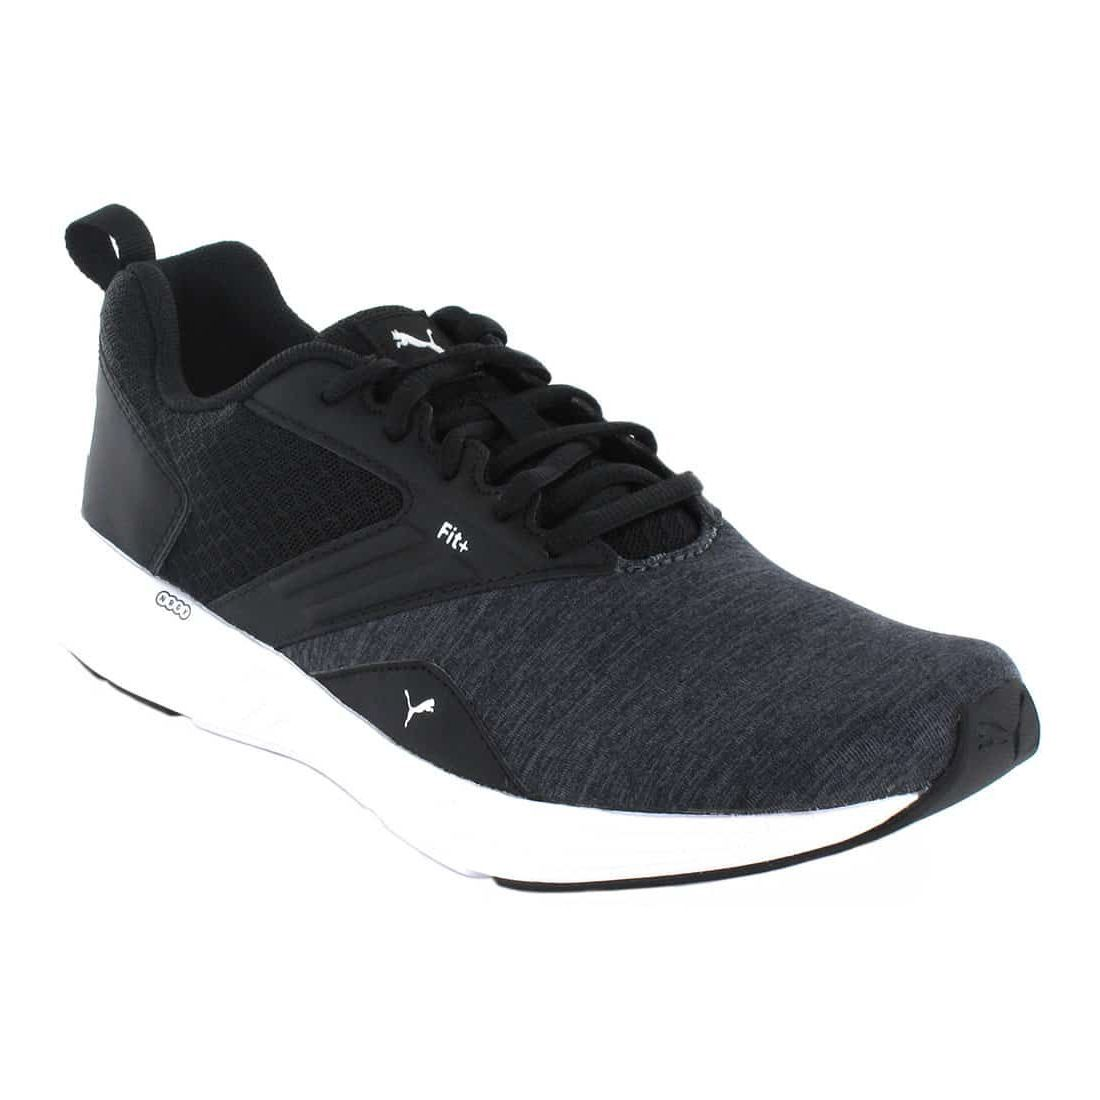 Puma NRGY Comet Black White - Running Man Sneakers